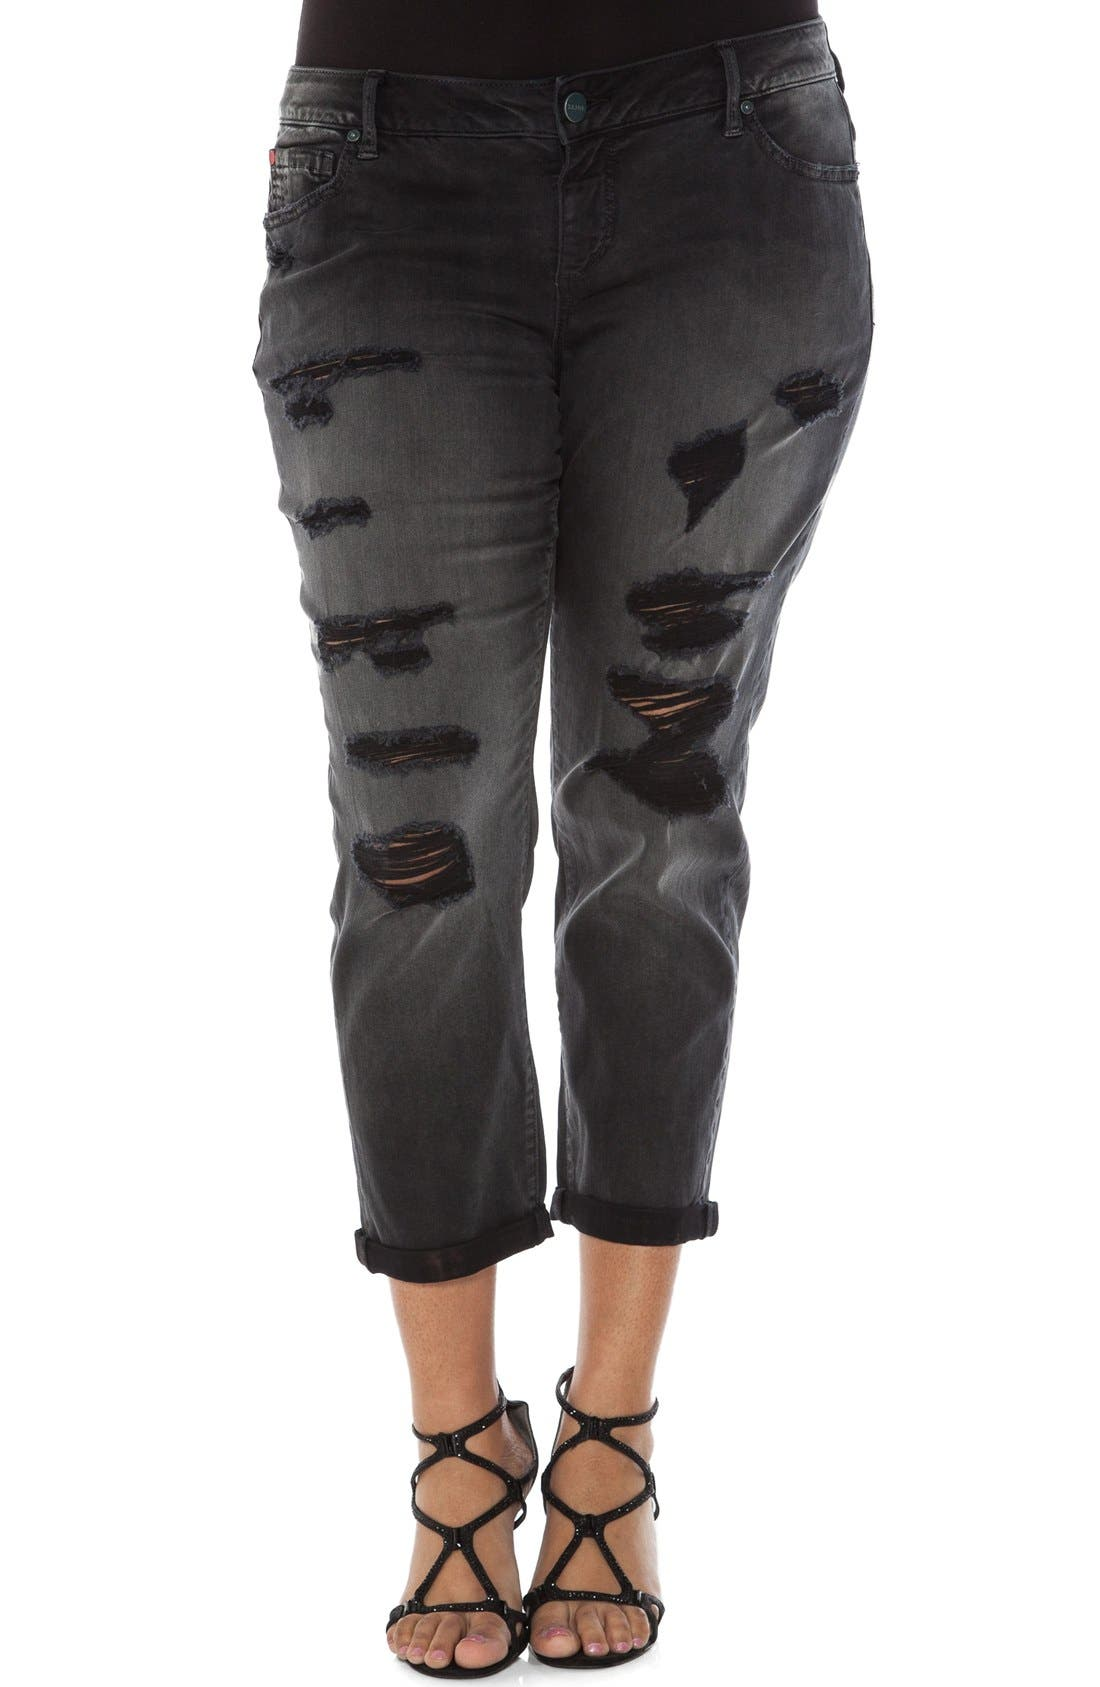 Main Image - SLINK Jeans Distressed Roll Cuff Stretch Boyfriend Jeans (Plus Size)